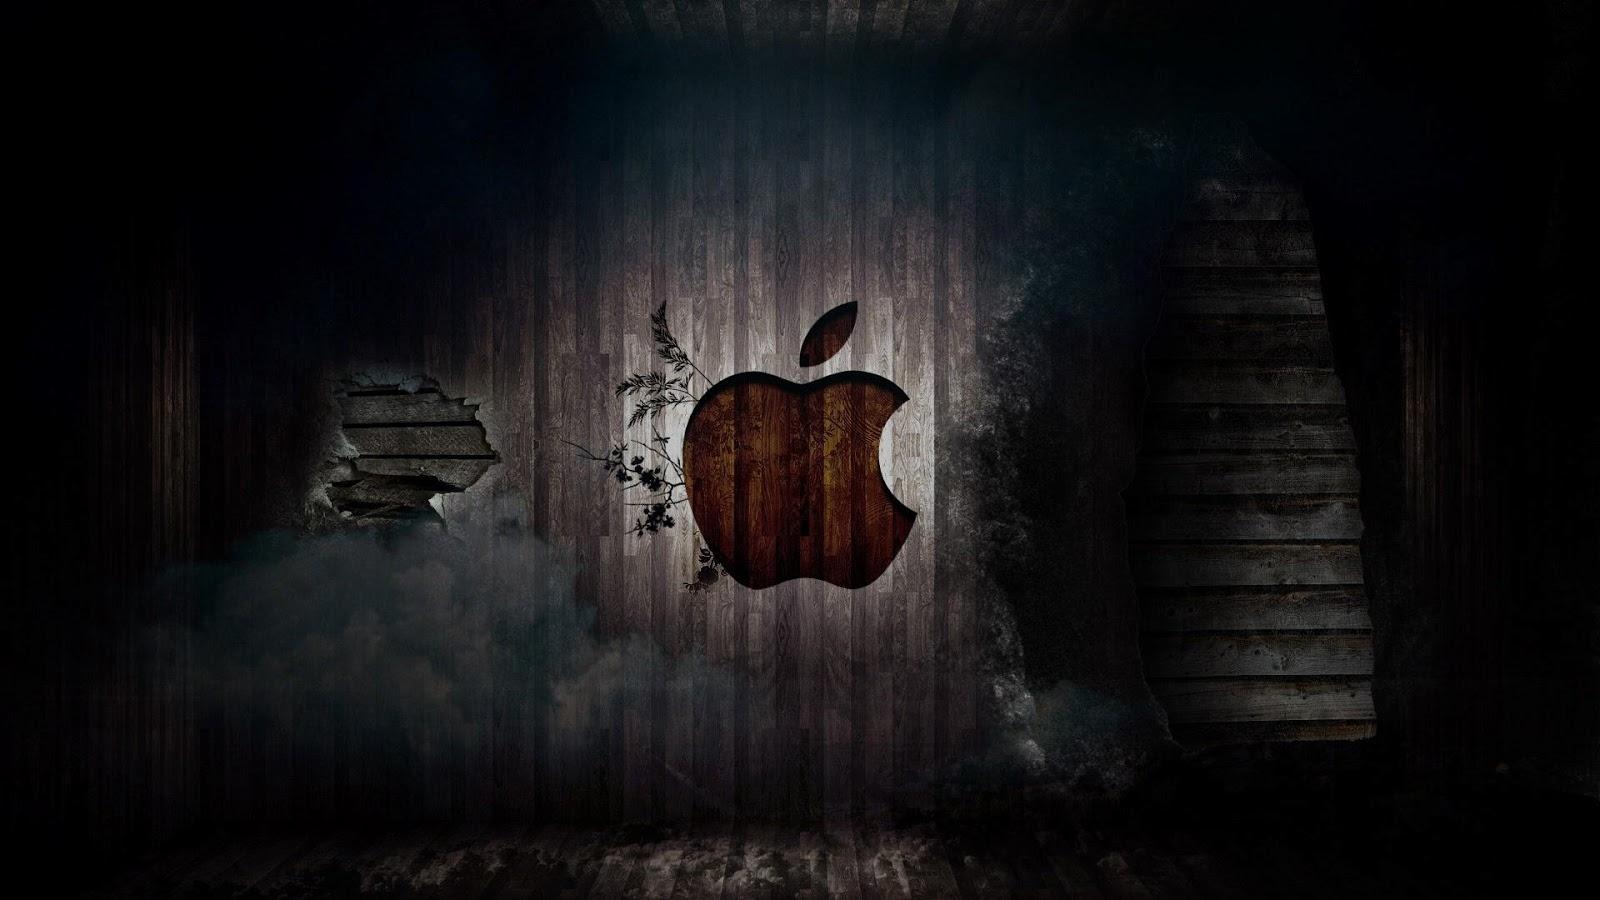 Hd Wallppaers Apple Wallpaper Hd 1080p